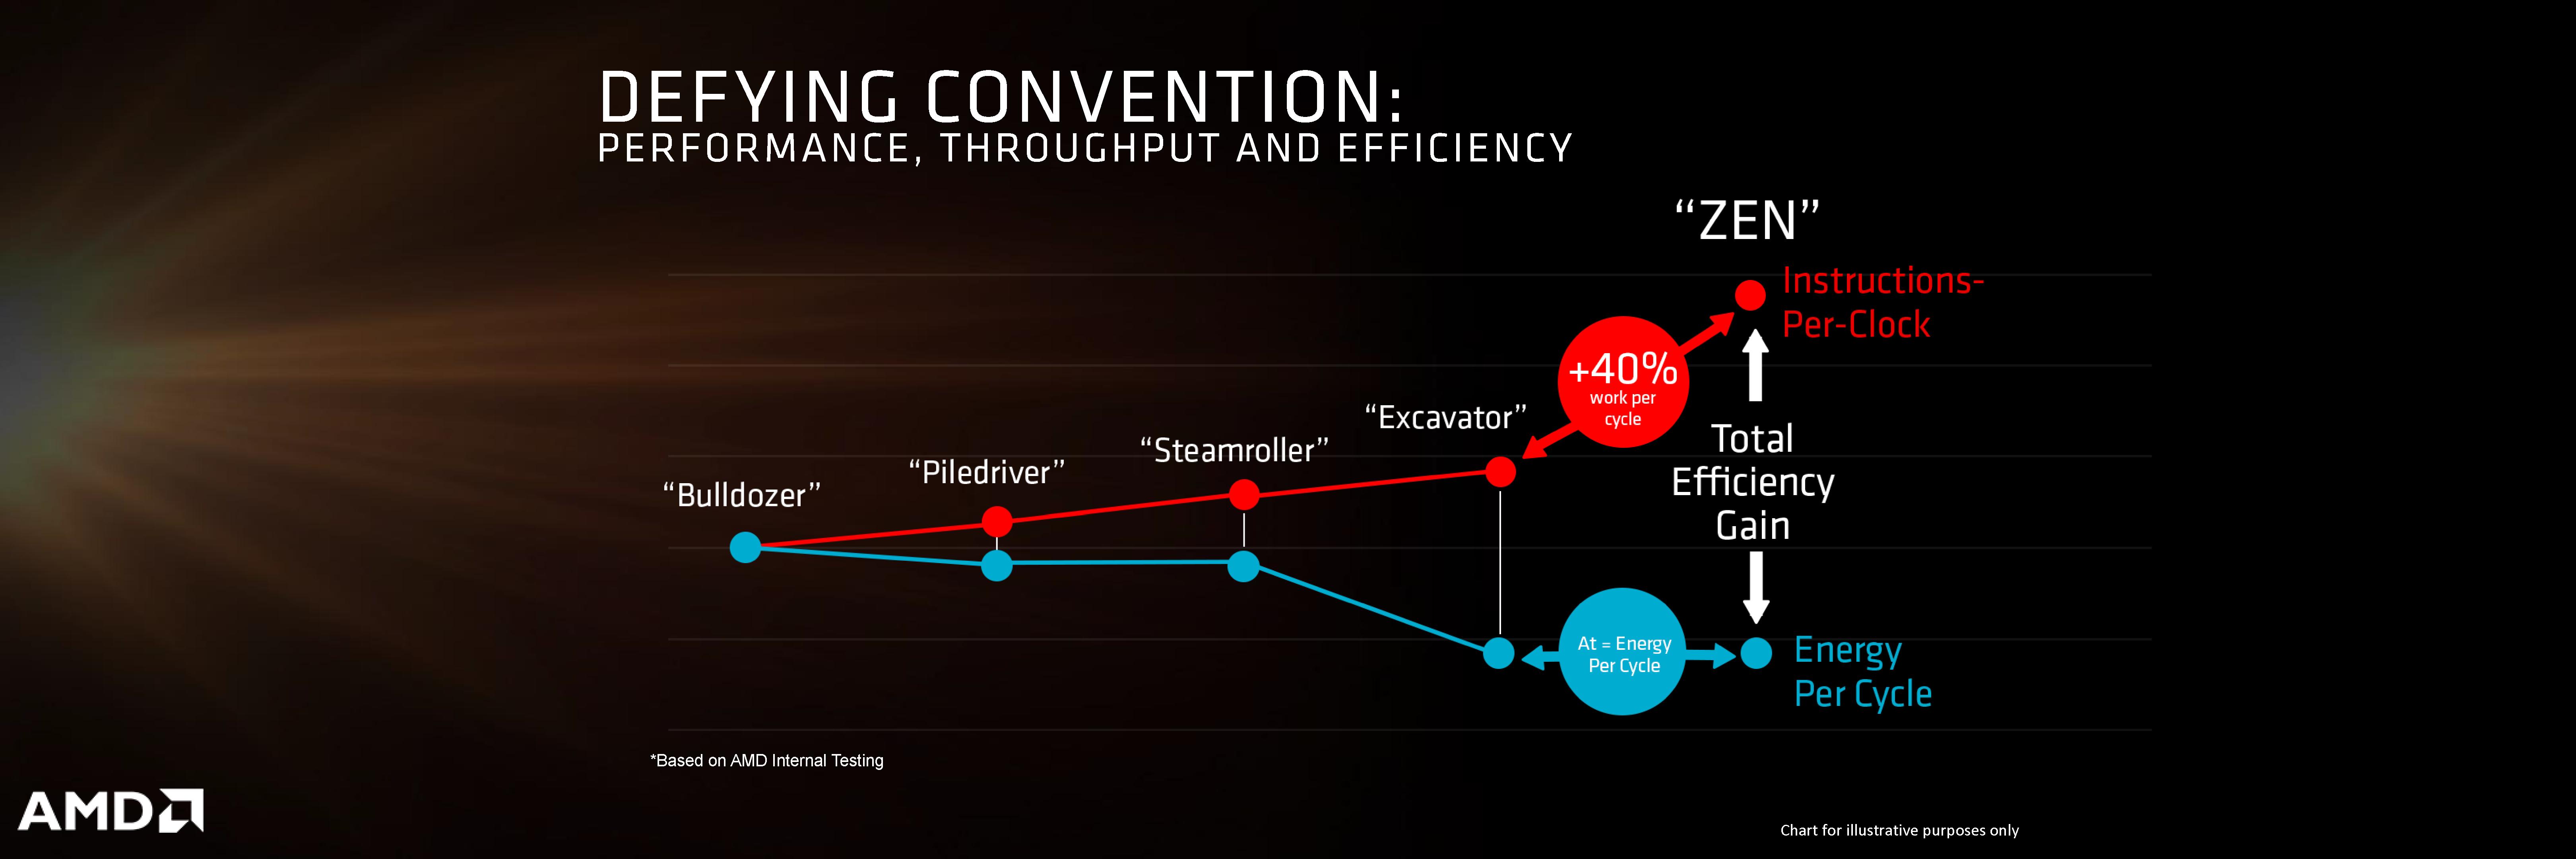 AMD Zen Summit Ridge Processors Rumored For Launch on 17th January